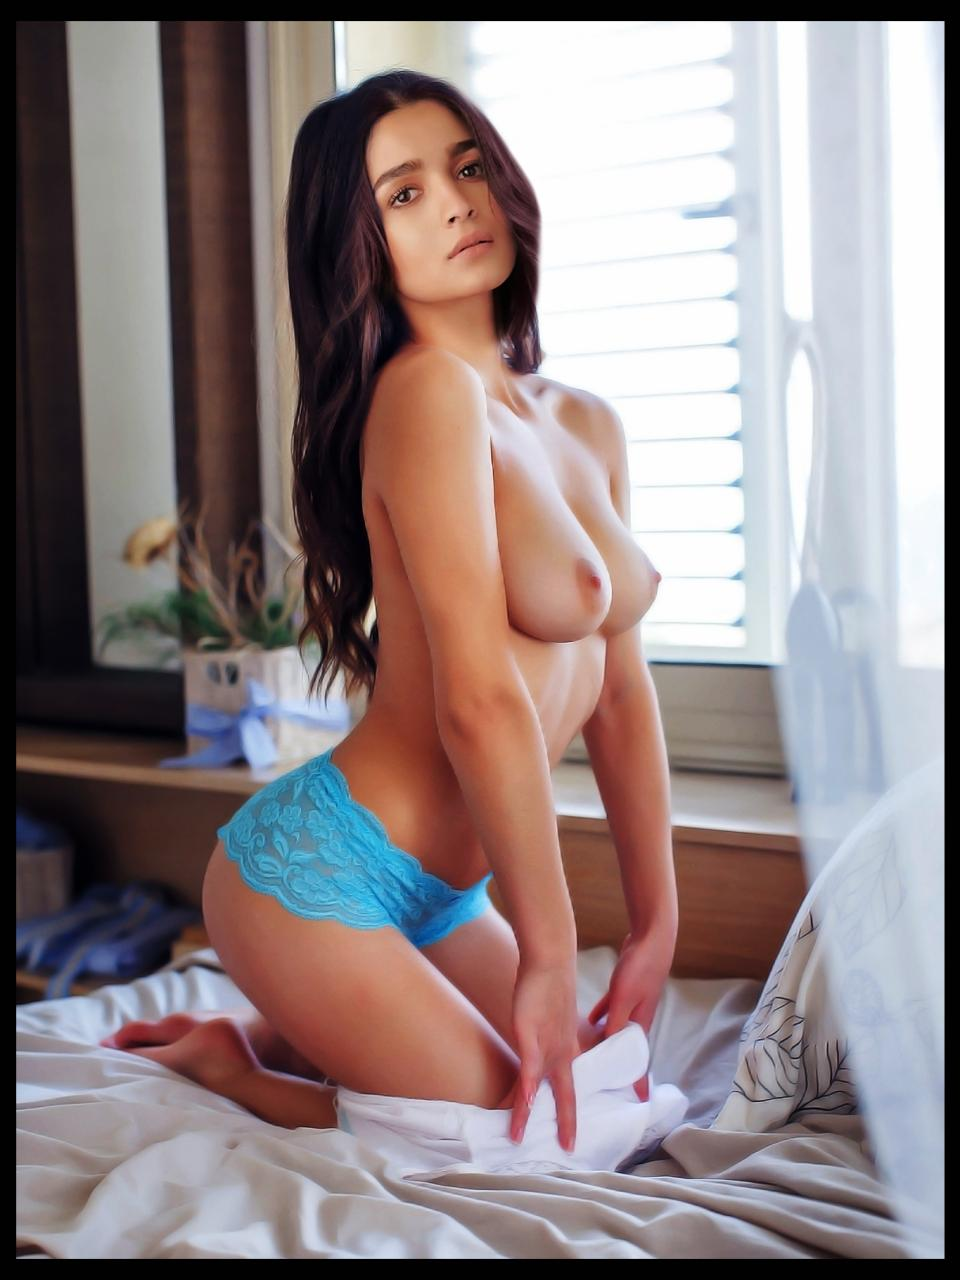 Alia Bhatt Topless Posing Her Boobs images